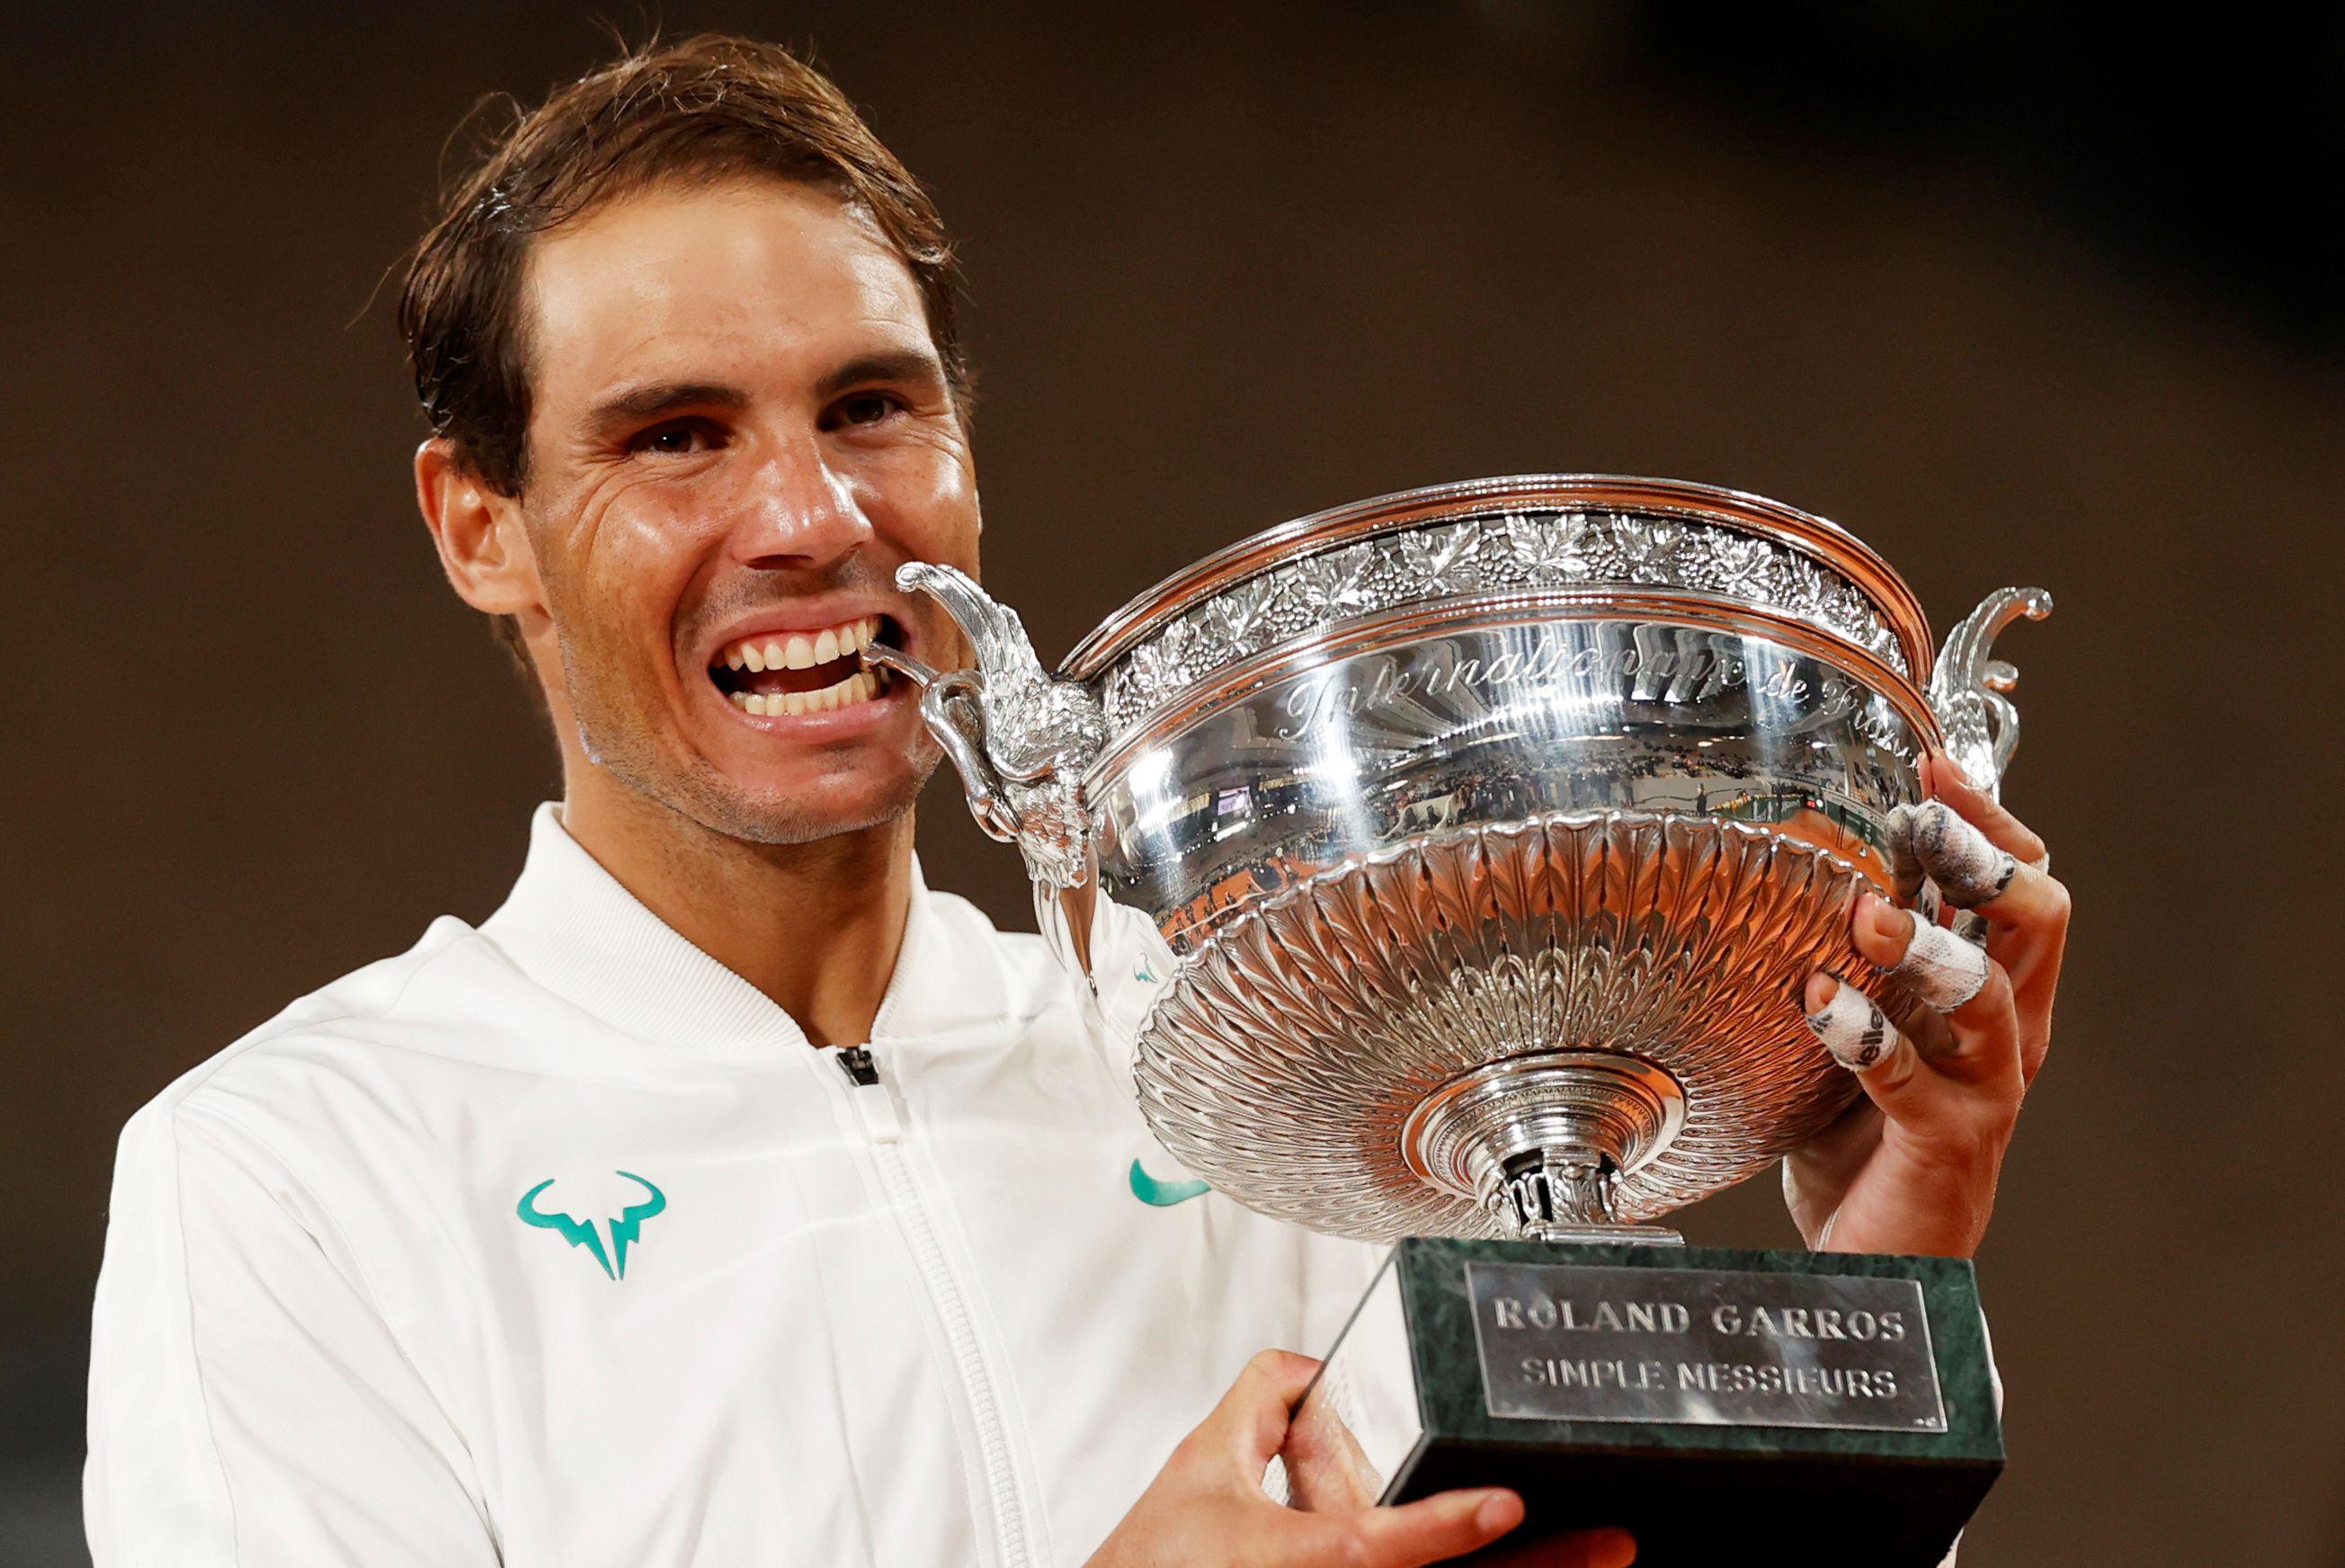 Nadal se alzó con su 13° Roland Garros (REUTERS/Christian Hartmann)